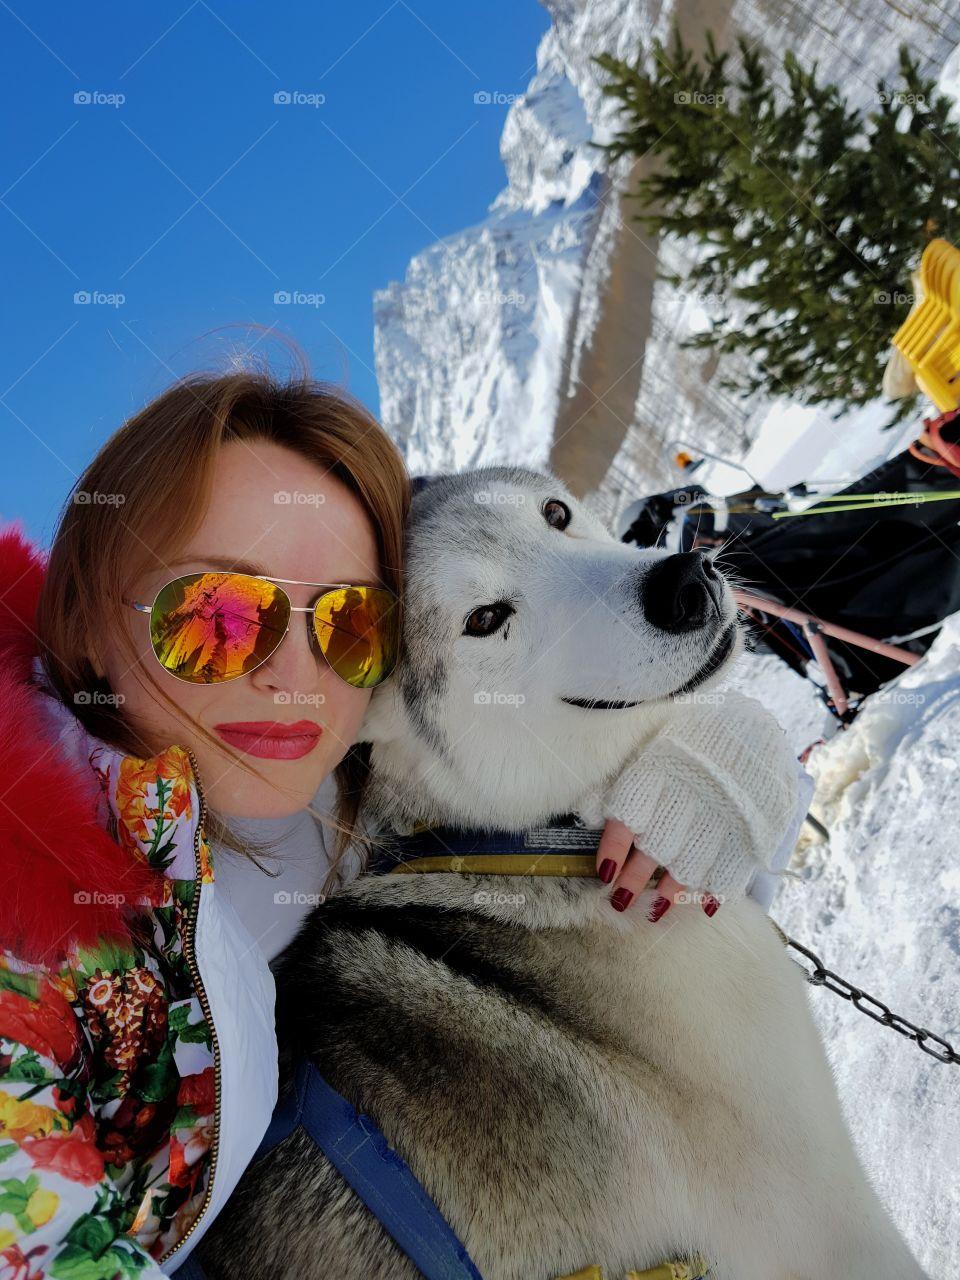 Stylish woman with cute dog